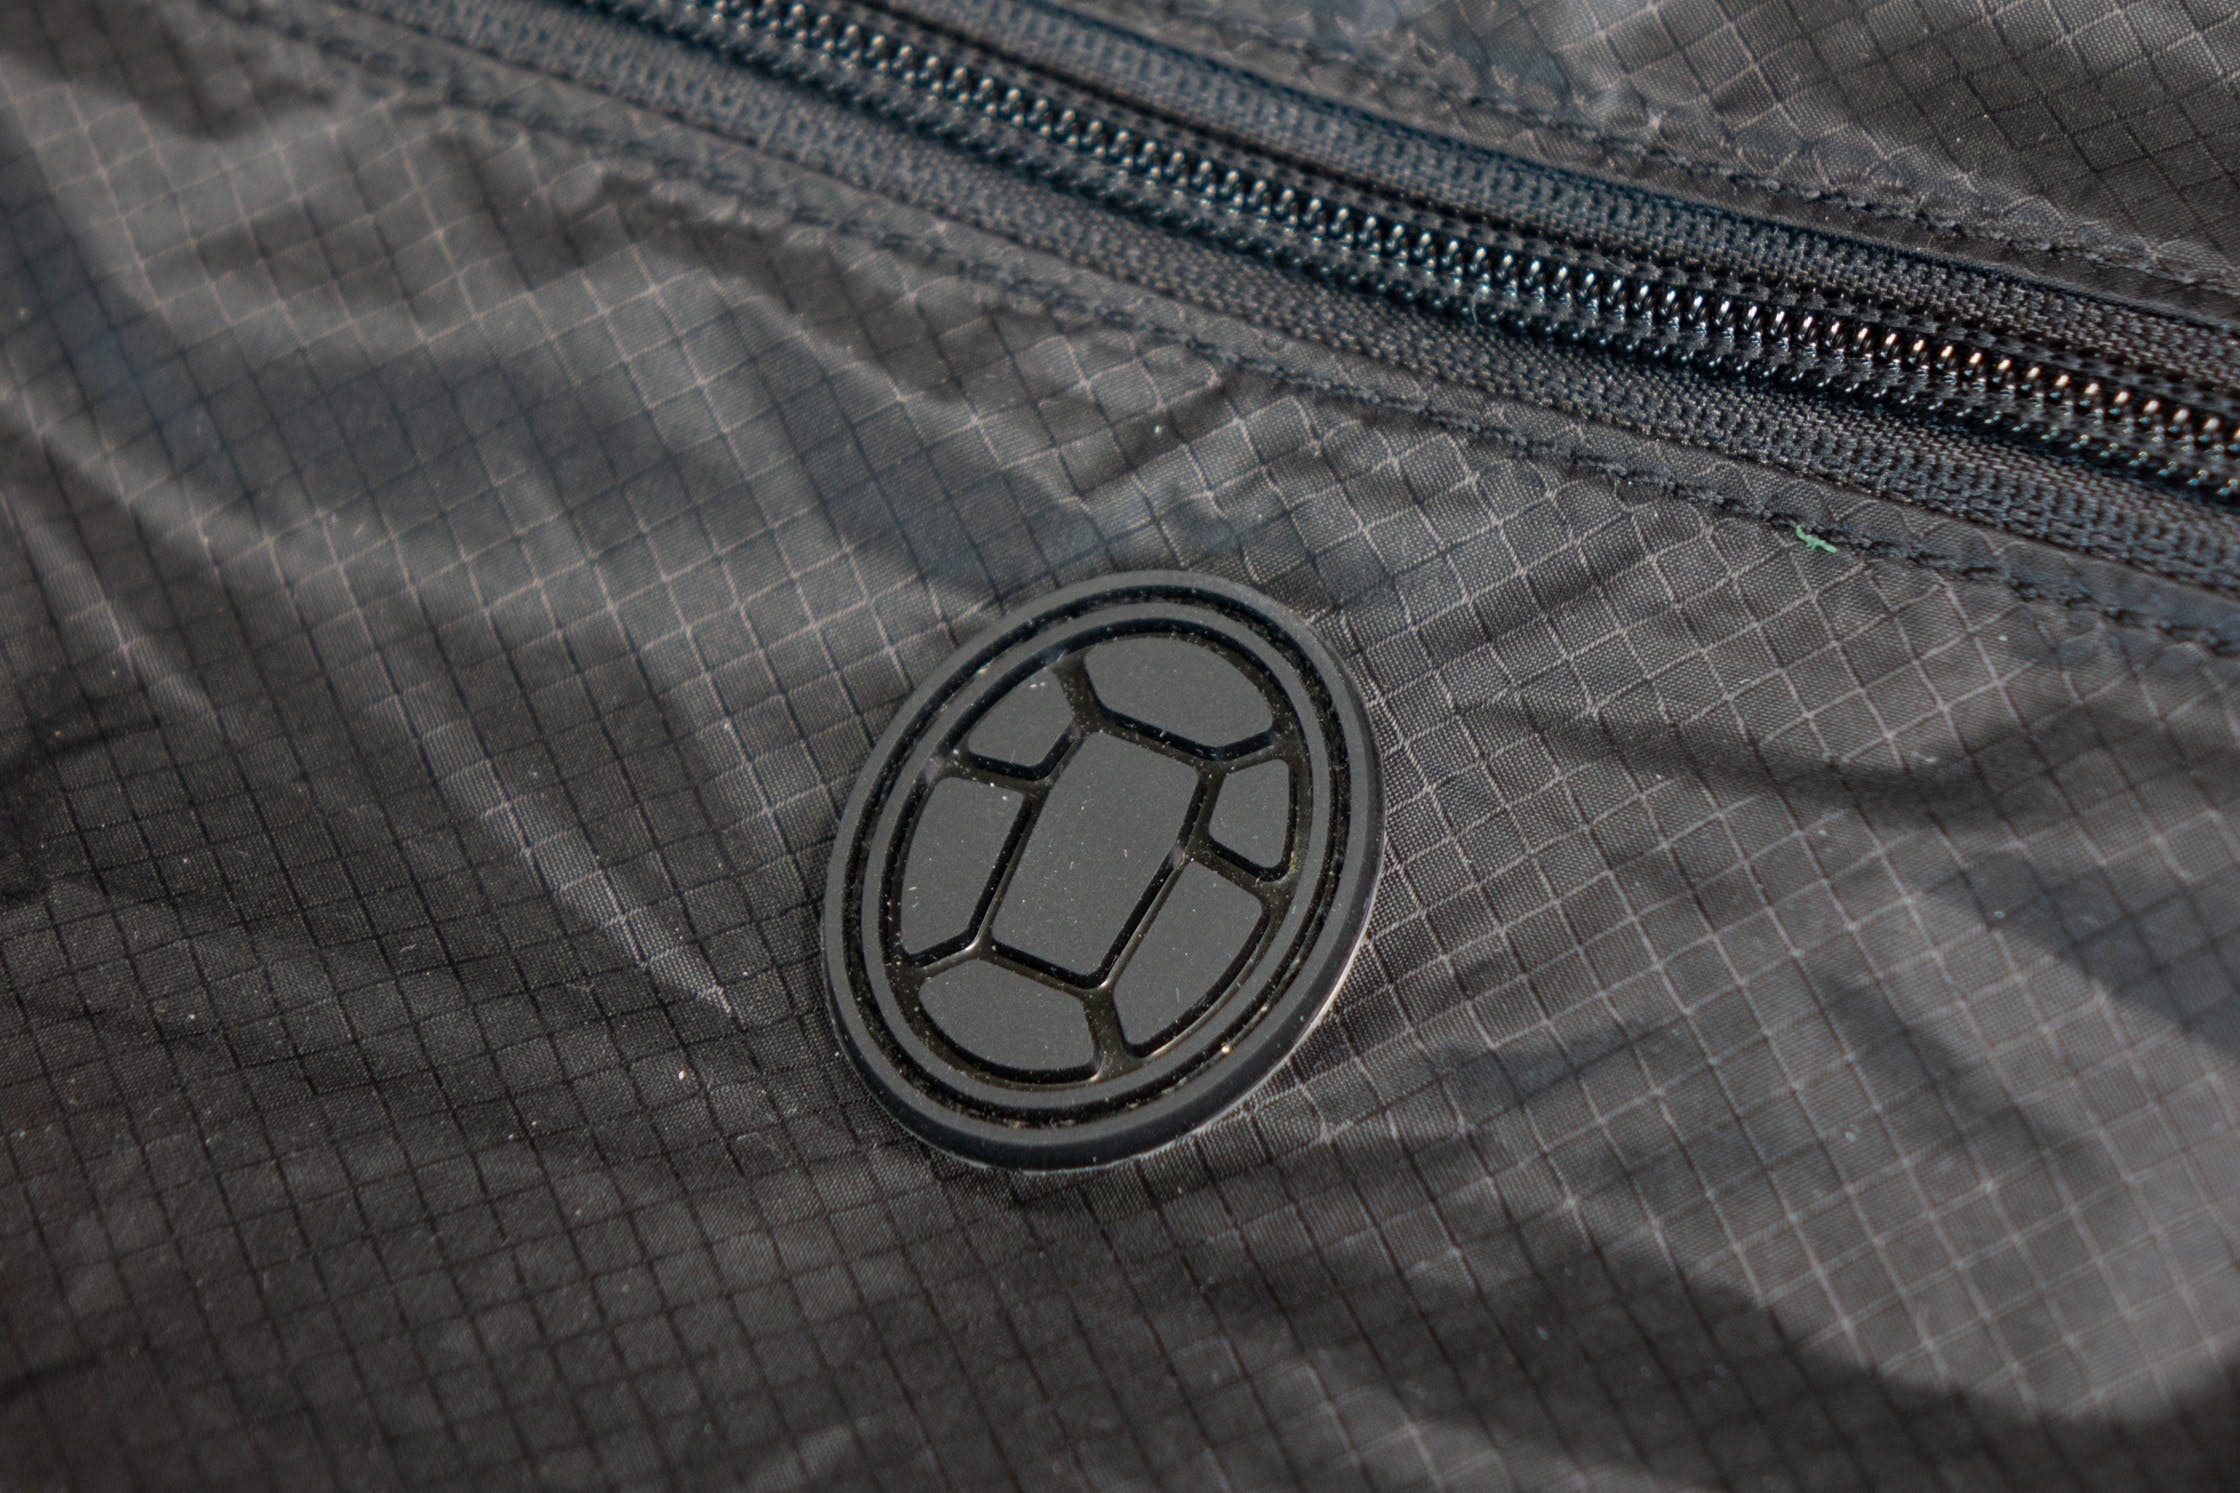 Tortuga Setout Packable Daypack Subtle Branding